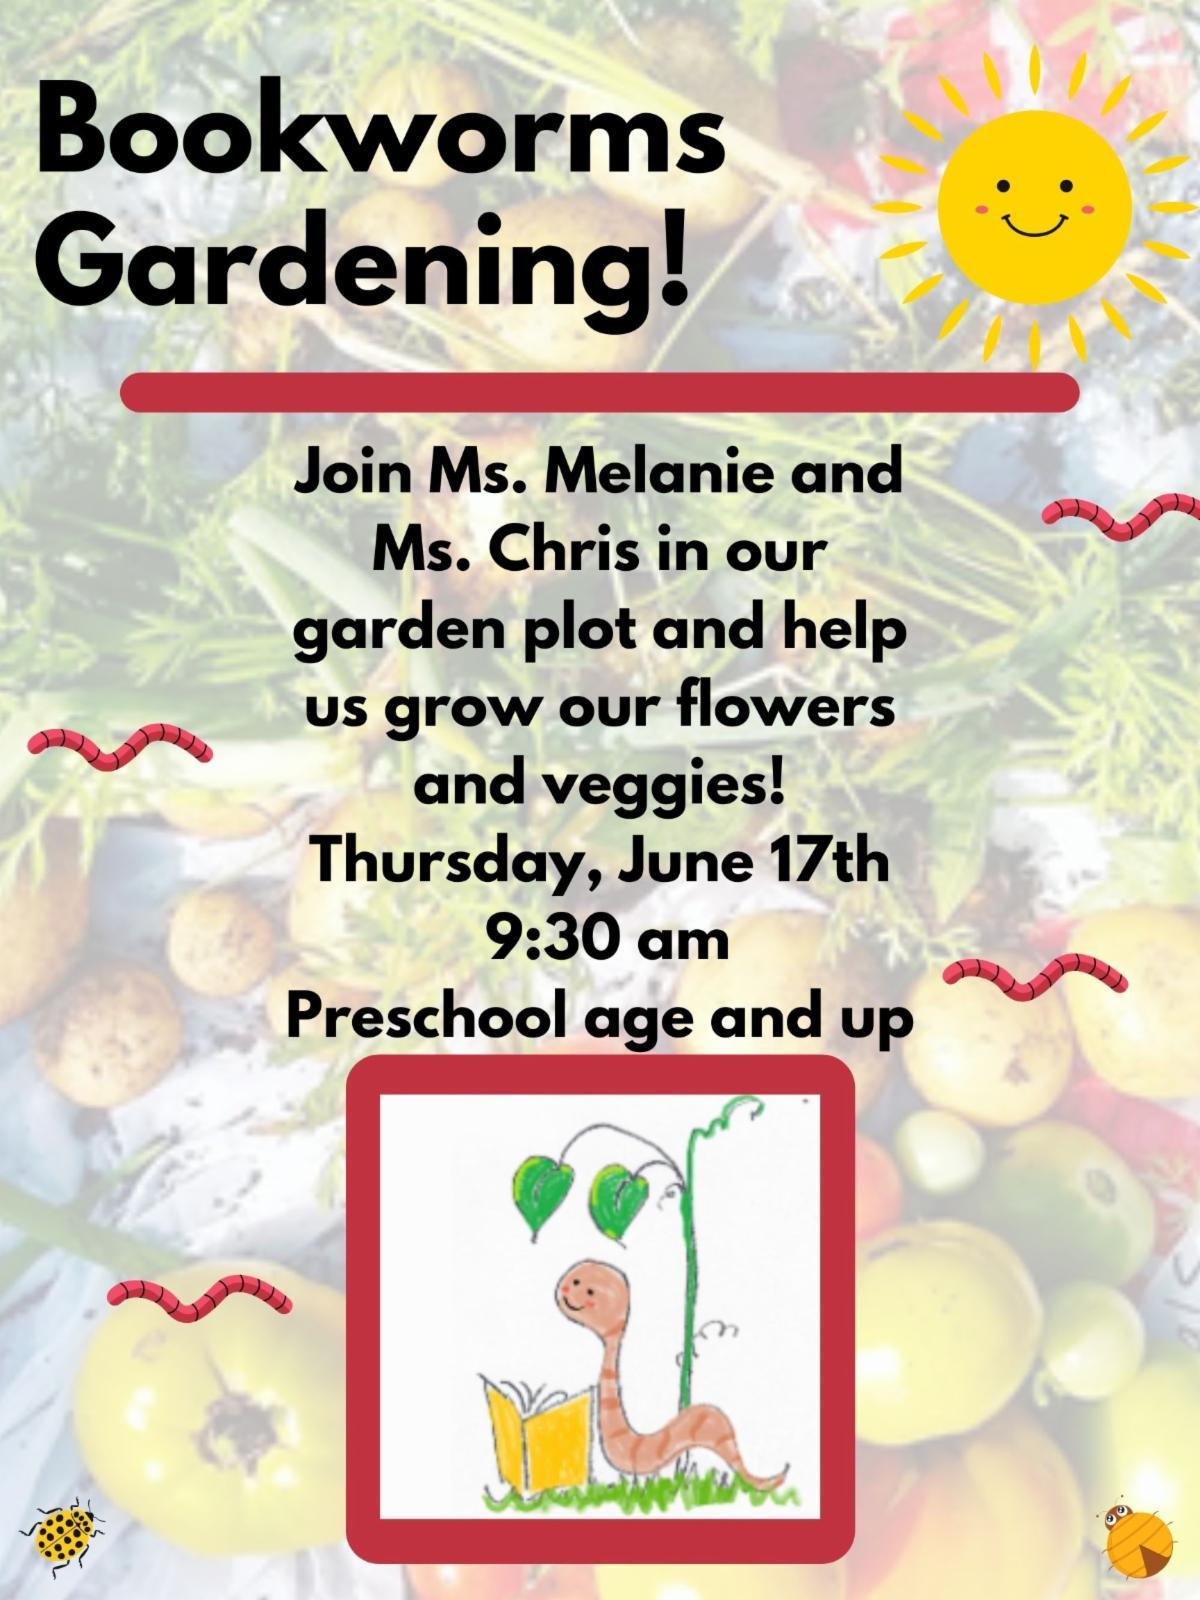 Poster of Bookworms Gardening.jpg